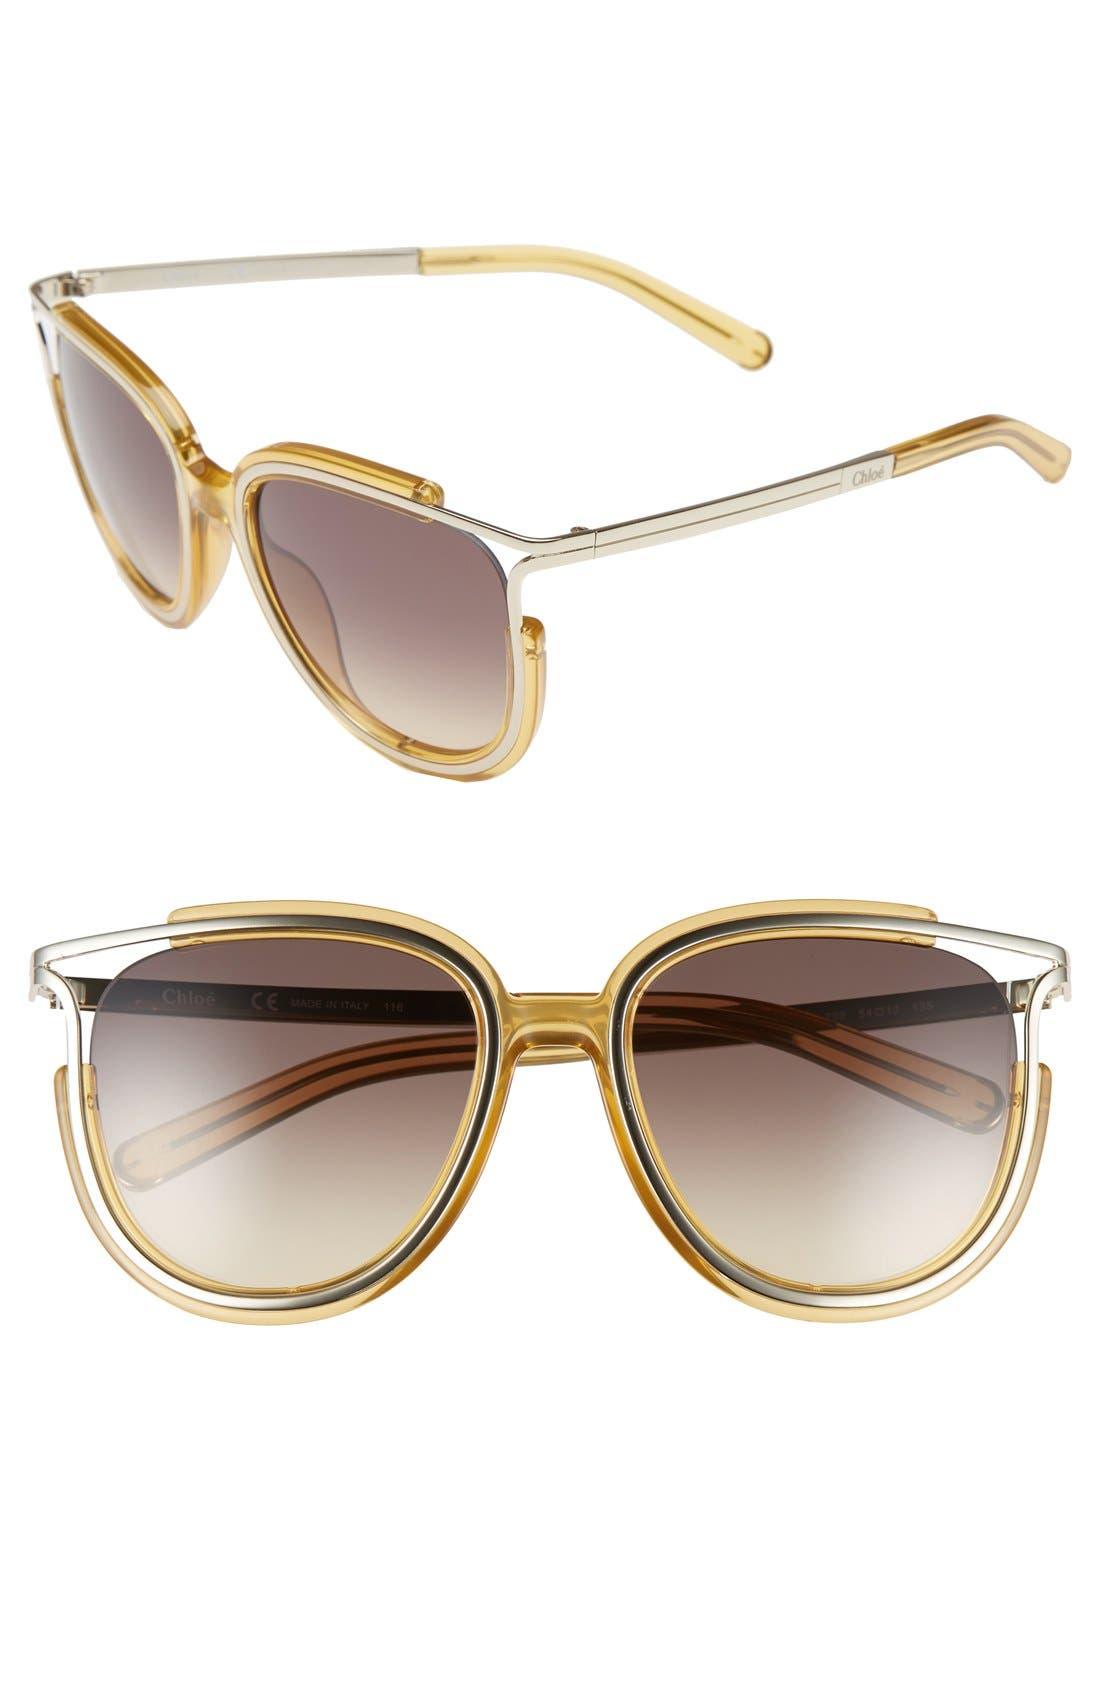 Alternate Image 1 Selected - Chloé 'Jayme' 54mm Retro Sunglasses